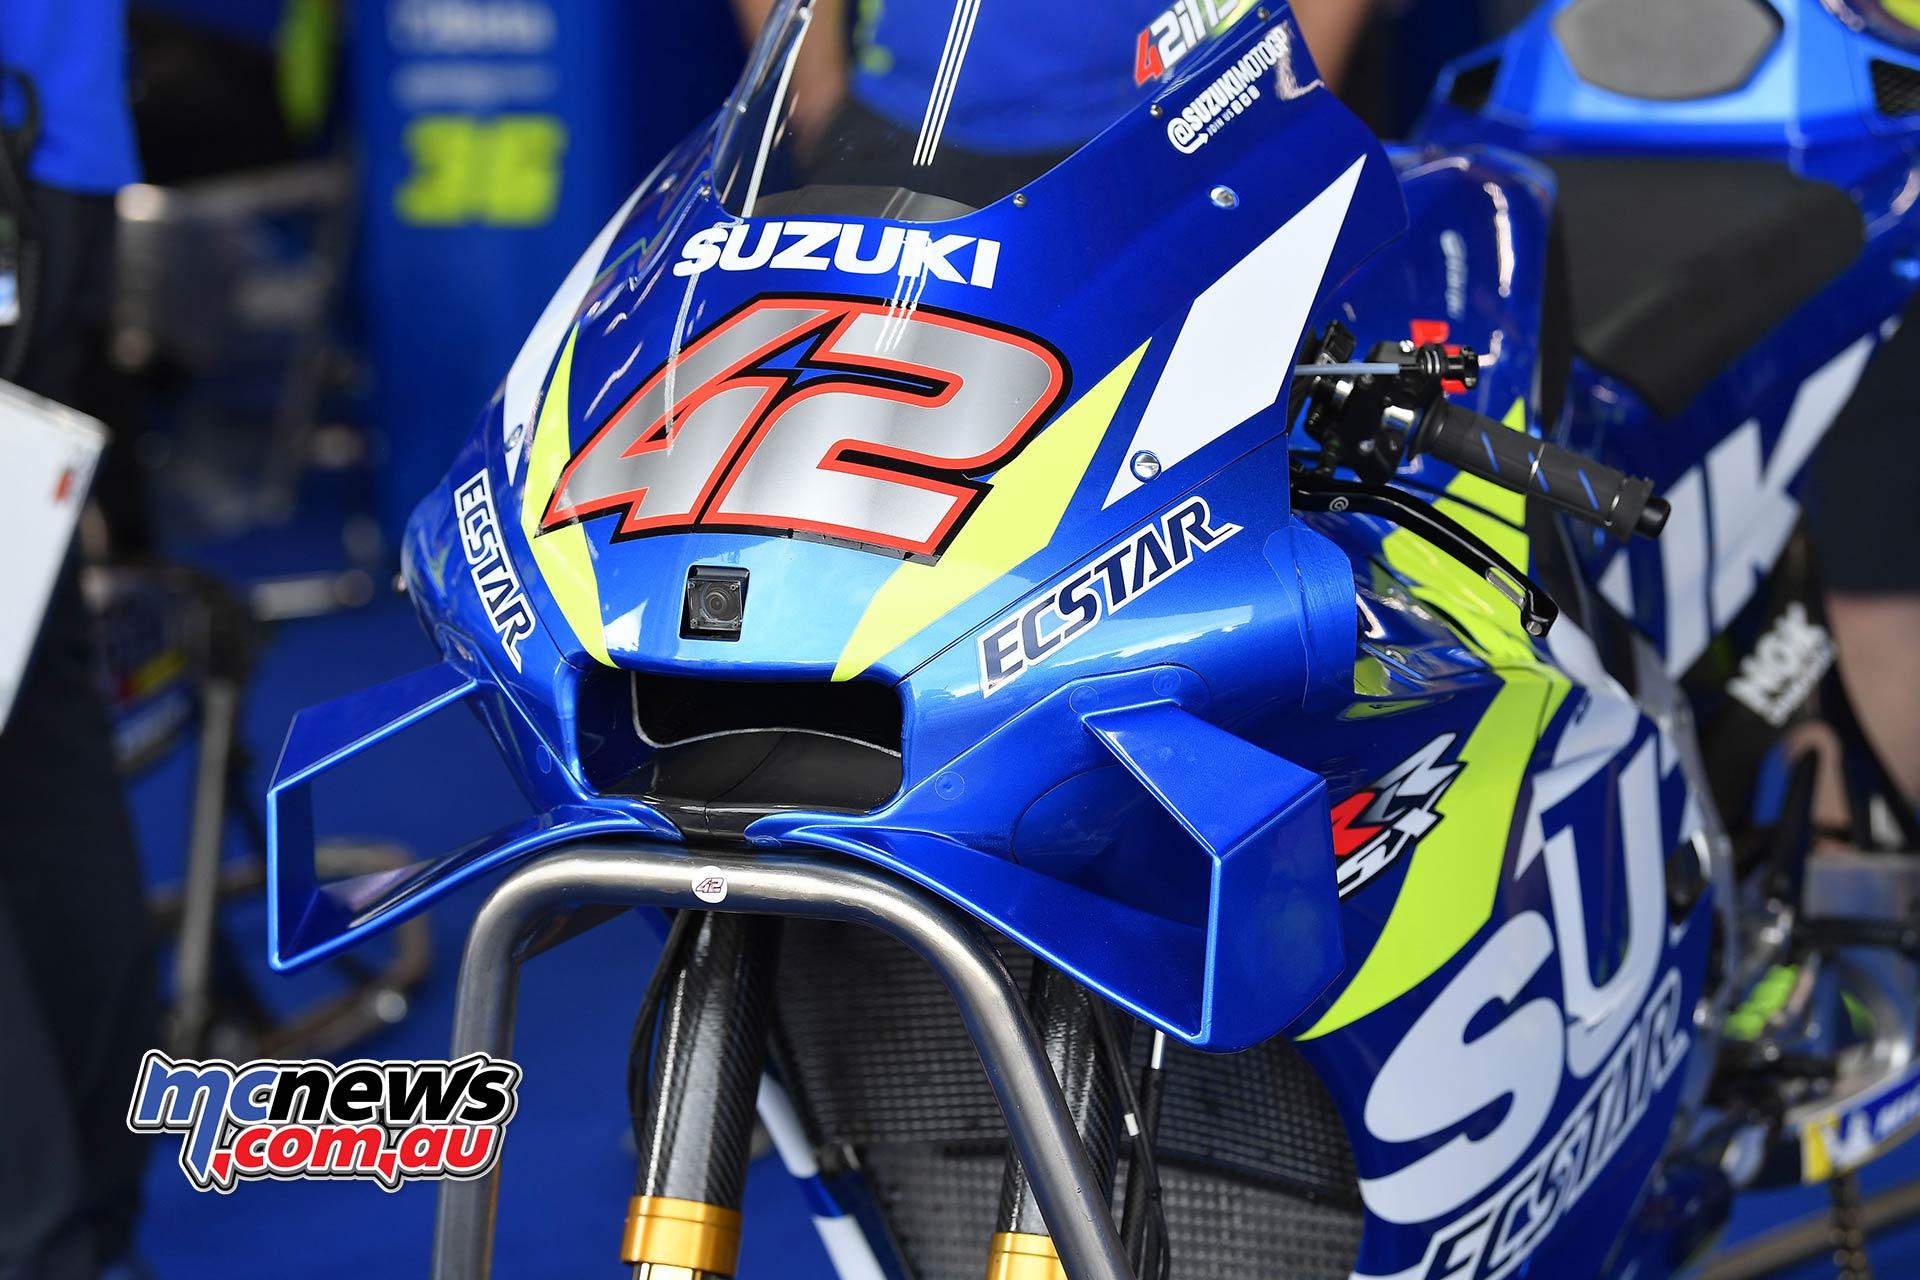 MotoGP Round Brno Fri Suzuki Aero Rins